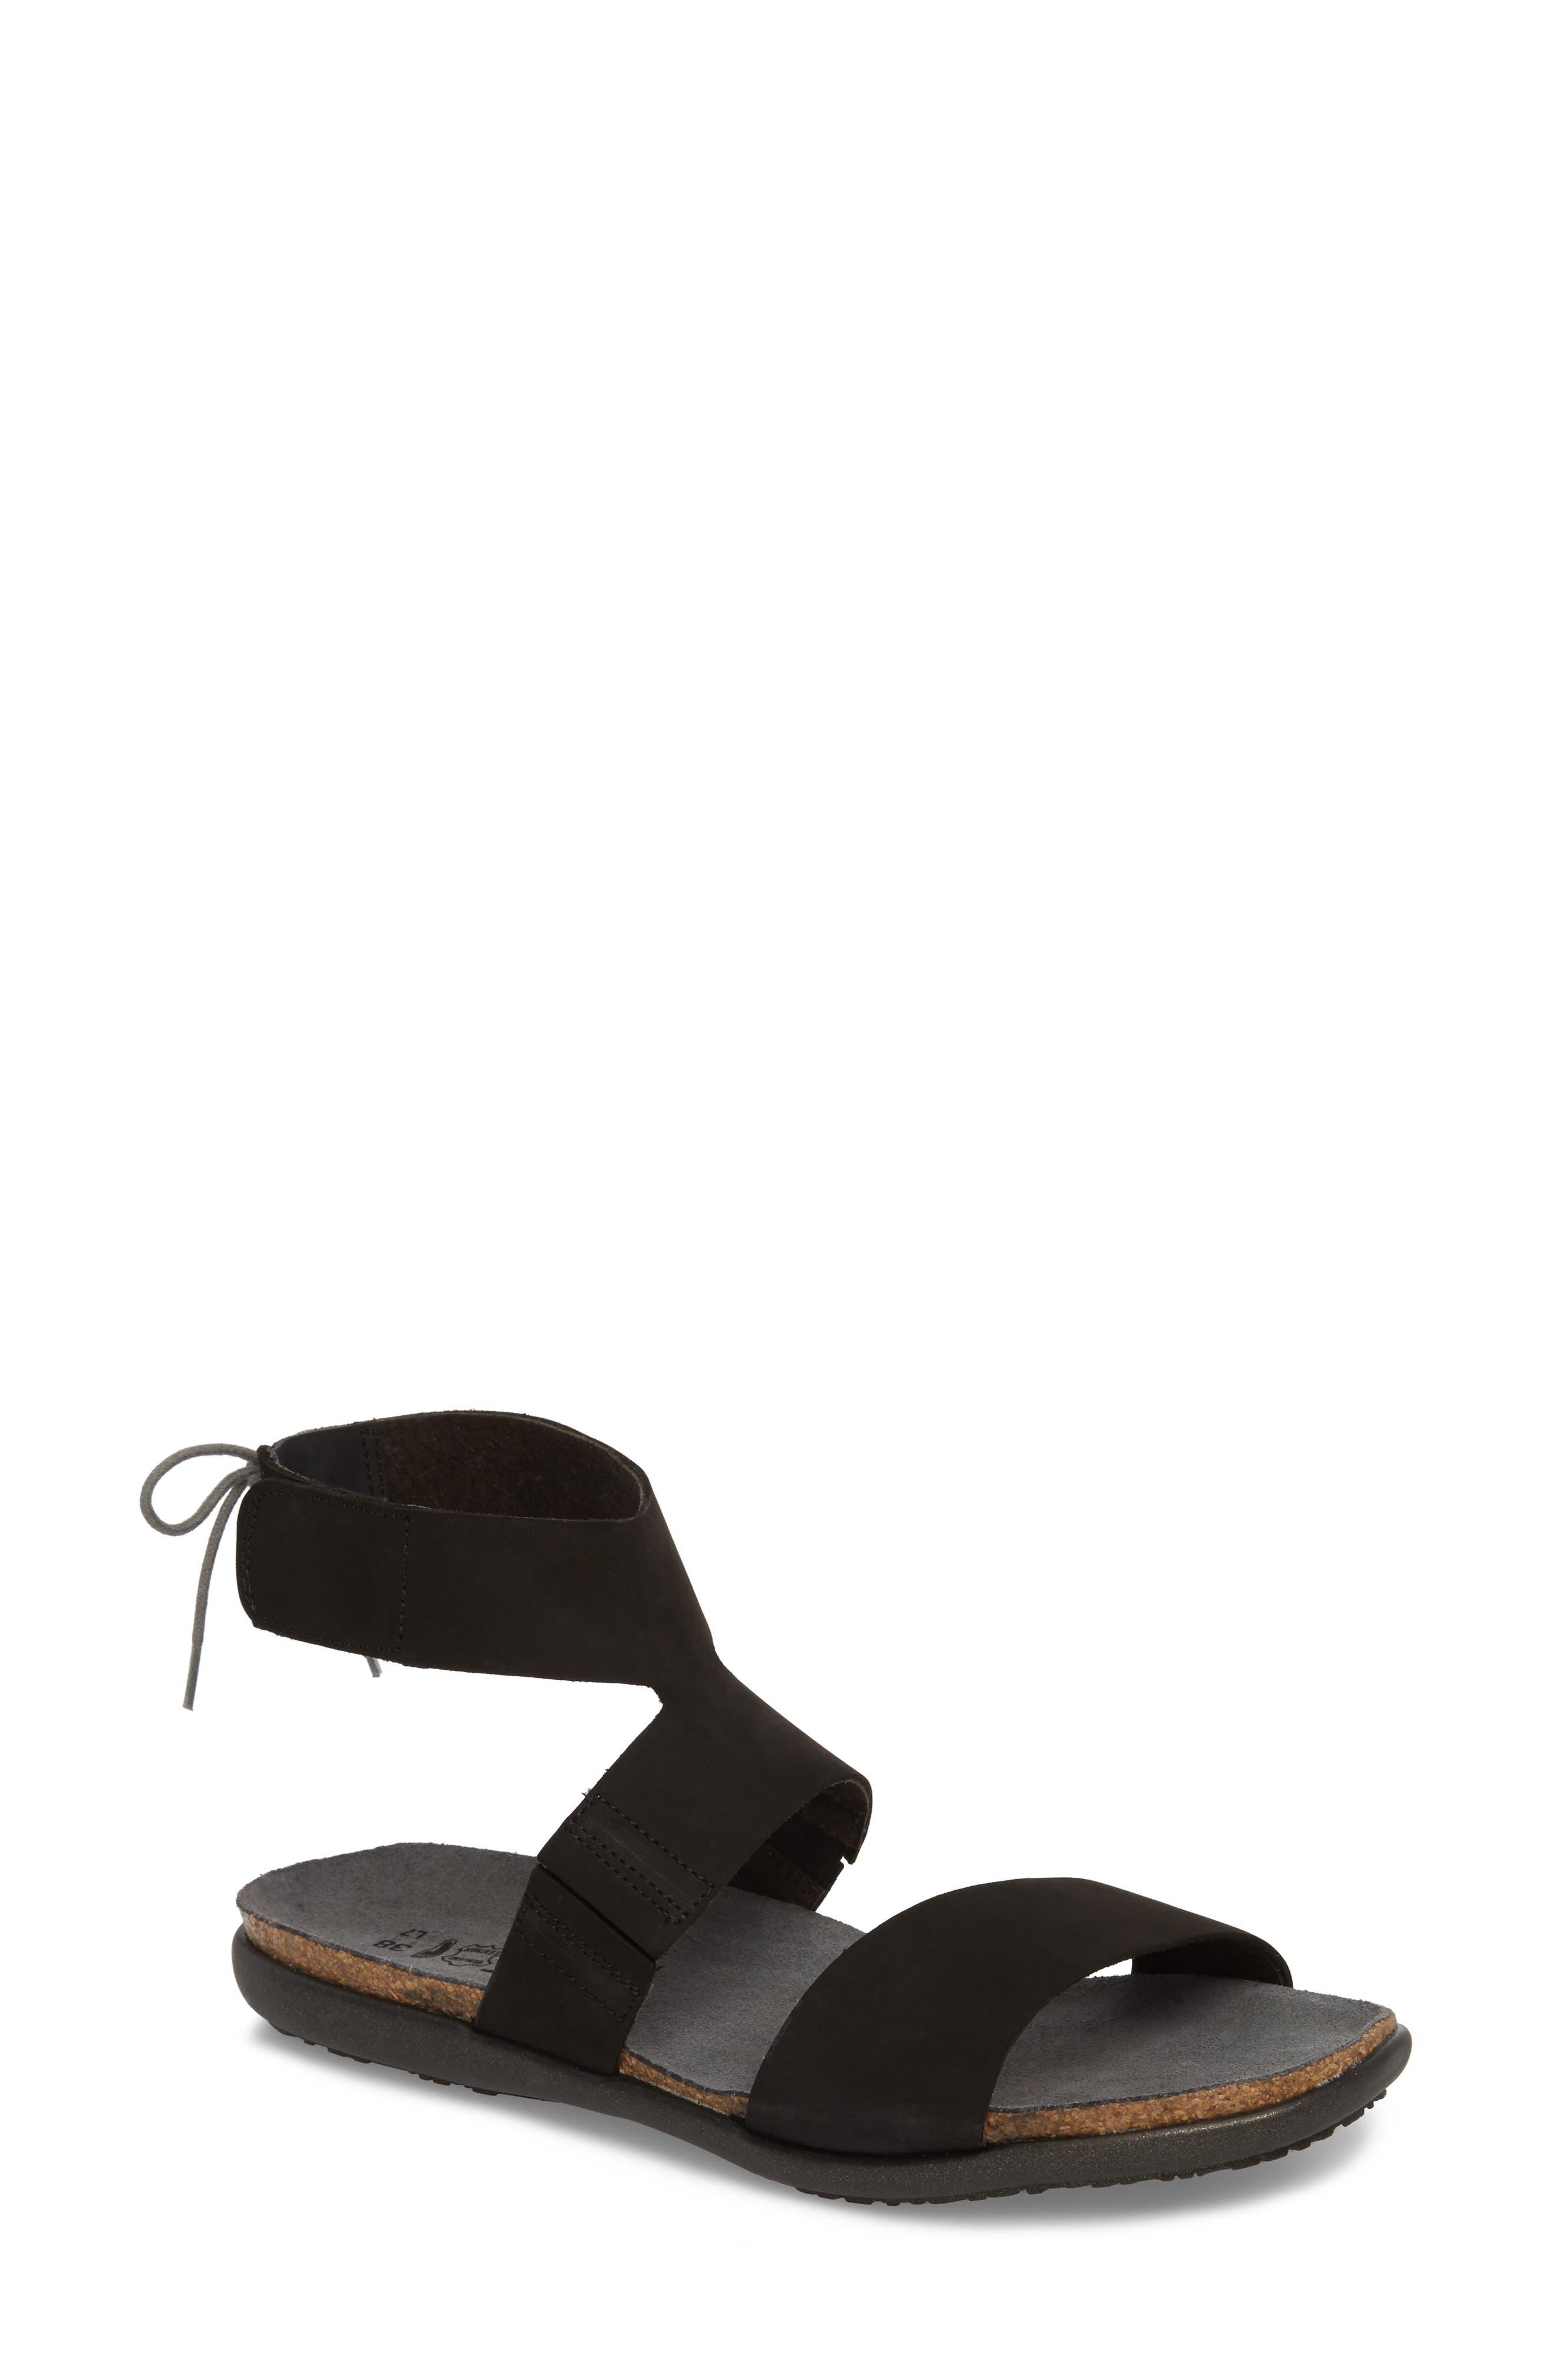 Larissa Ankle Strap Sandal,                             Main thumbnail 1, color,                             Black Velvet Nubuck